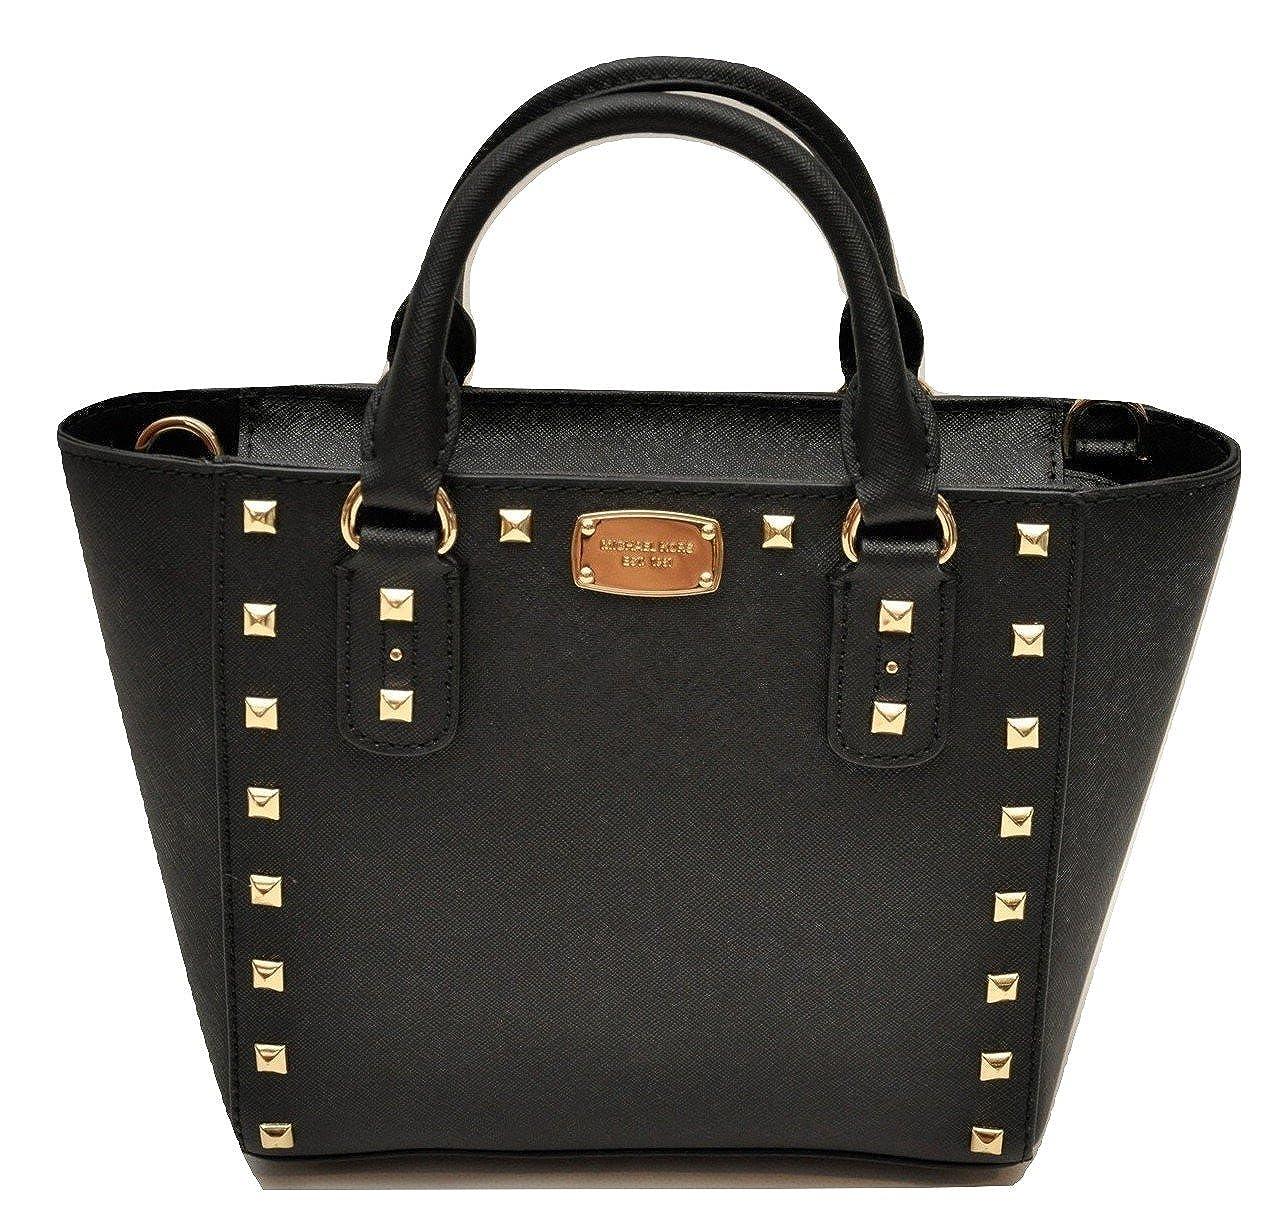 0179e5cc263a Michael Kors Sandrine Stud Small Crossbody Saffiano Leather Bag Handbag  (Black)  Handbags  Amazon.com